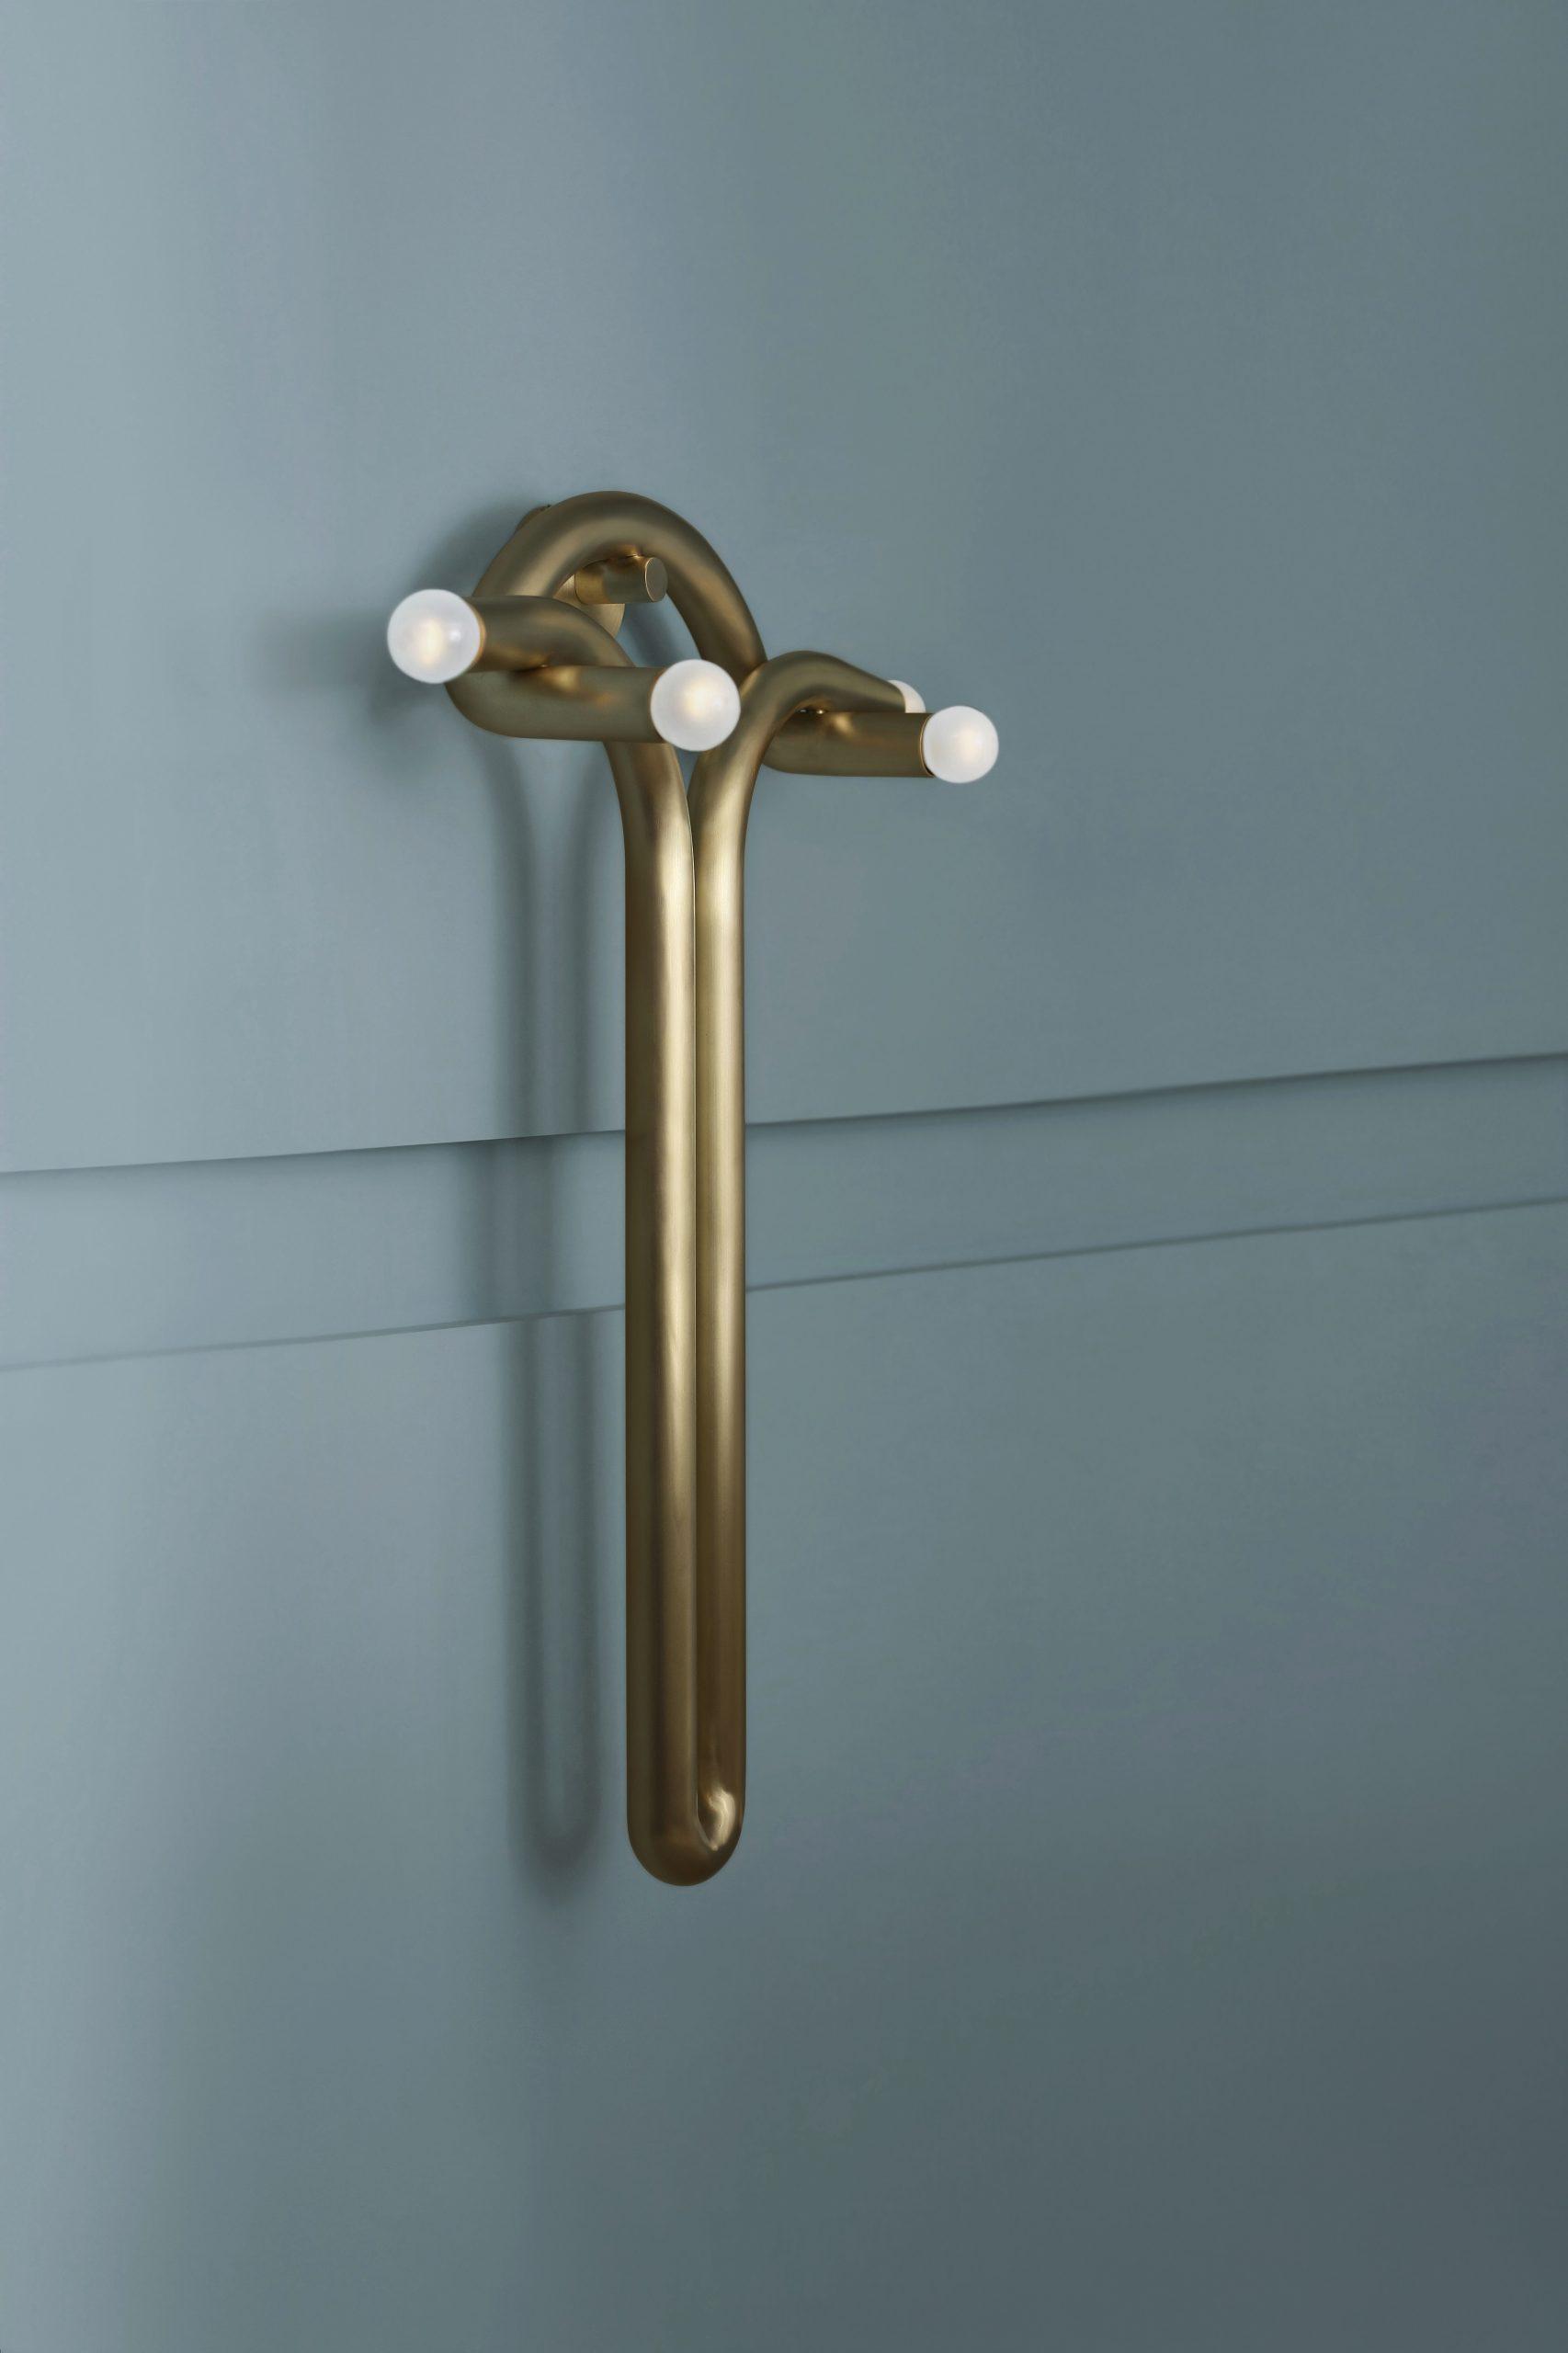 Paul Matter has designed a sconce light fixture